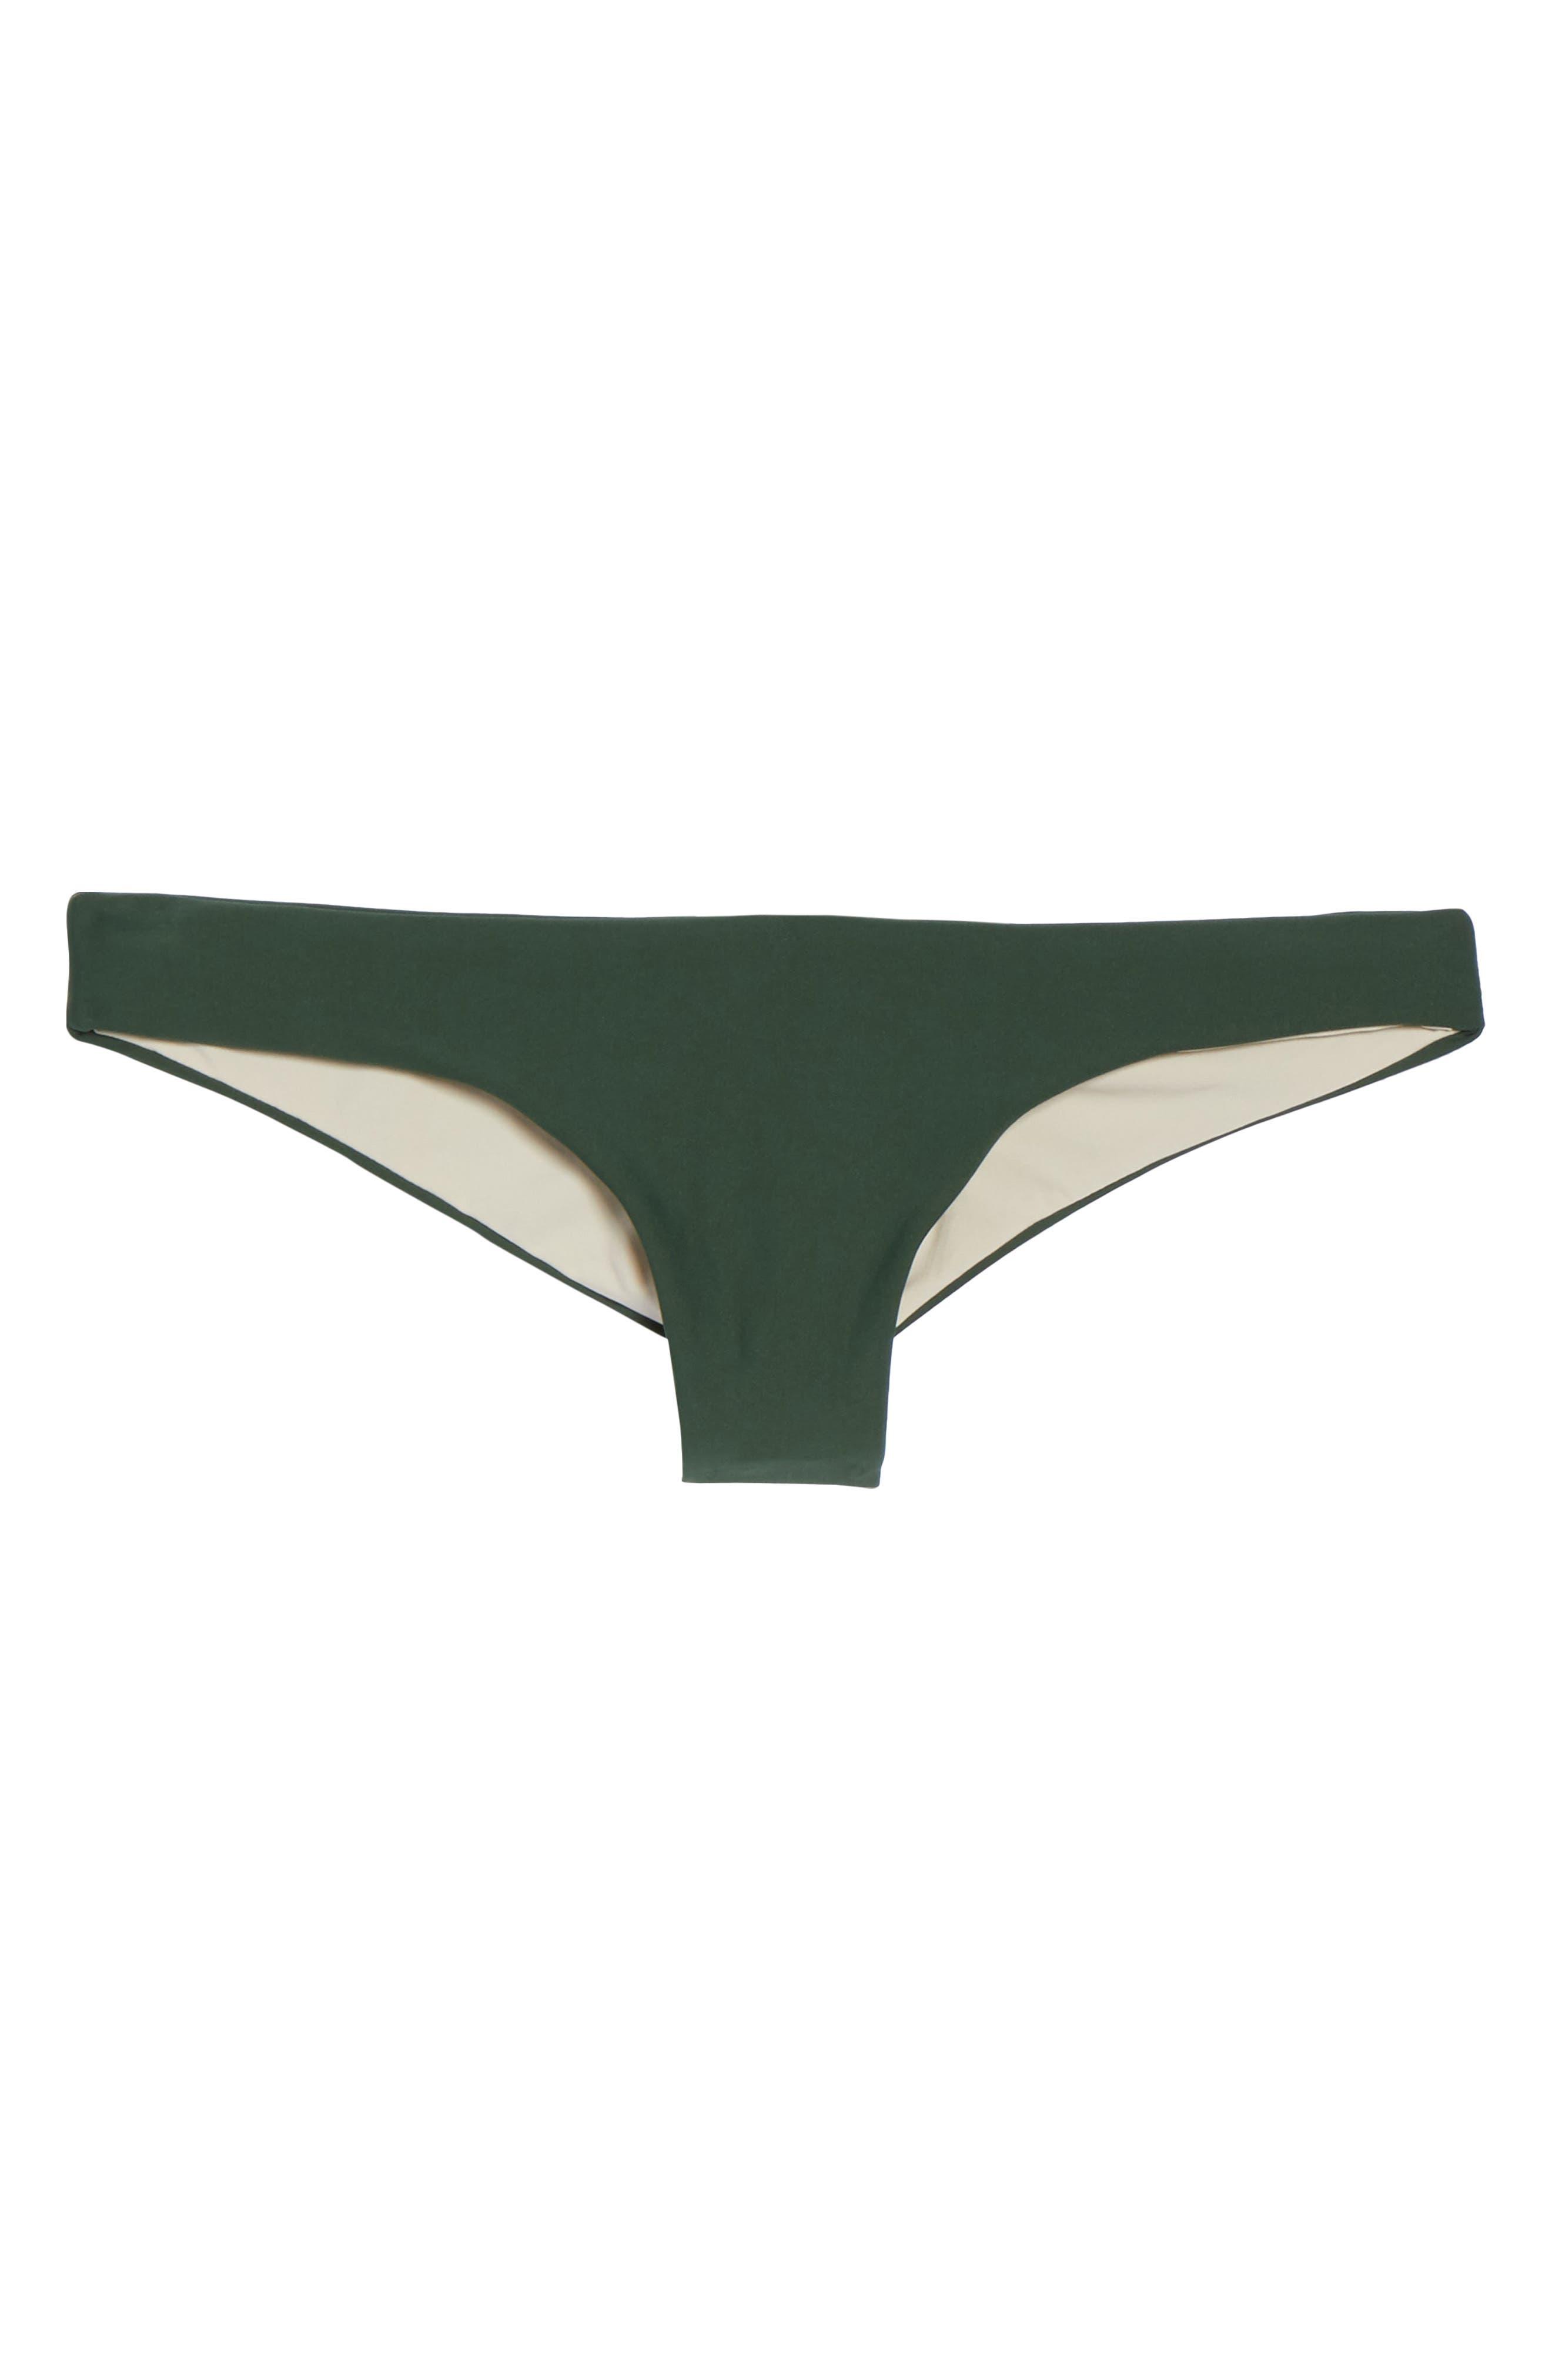 Ruched Bikini Bottoms,                             Alternate thumbnail 6, color,                             300